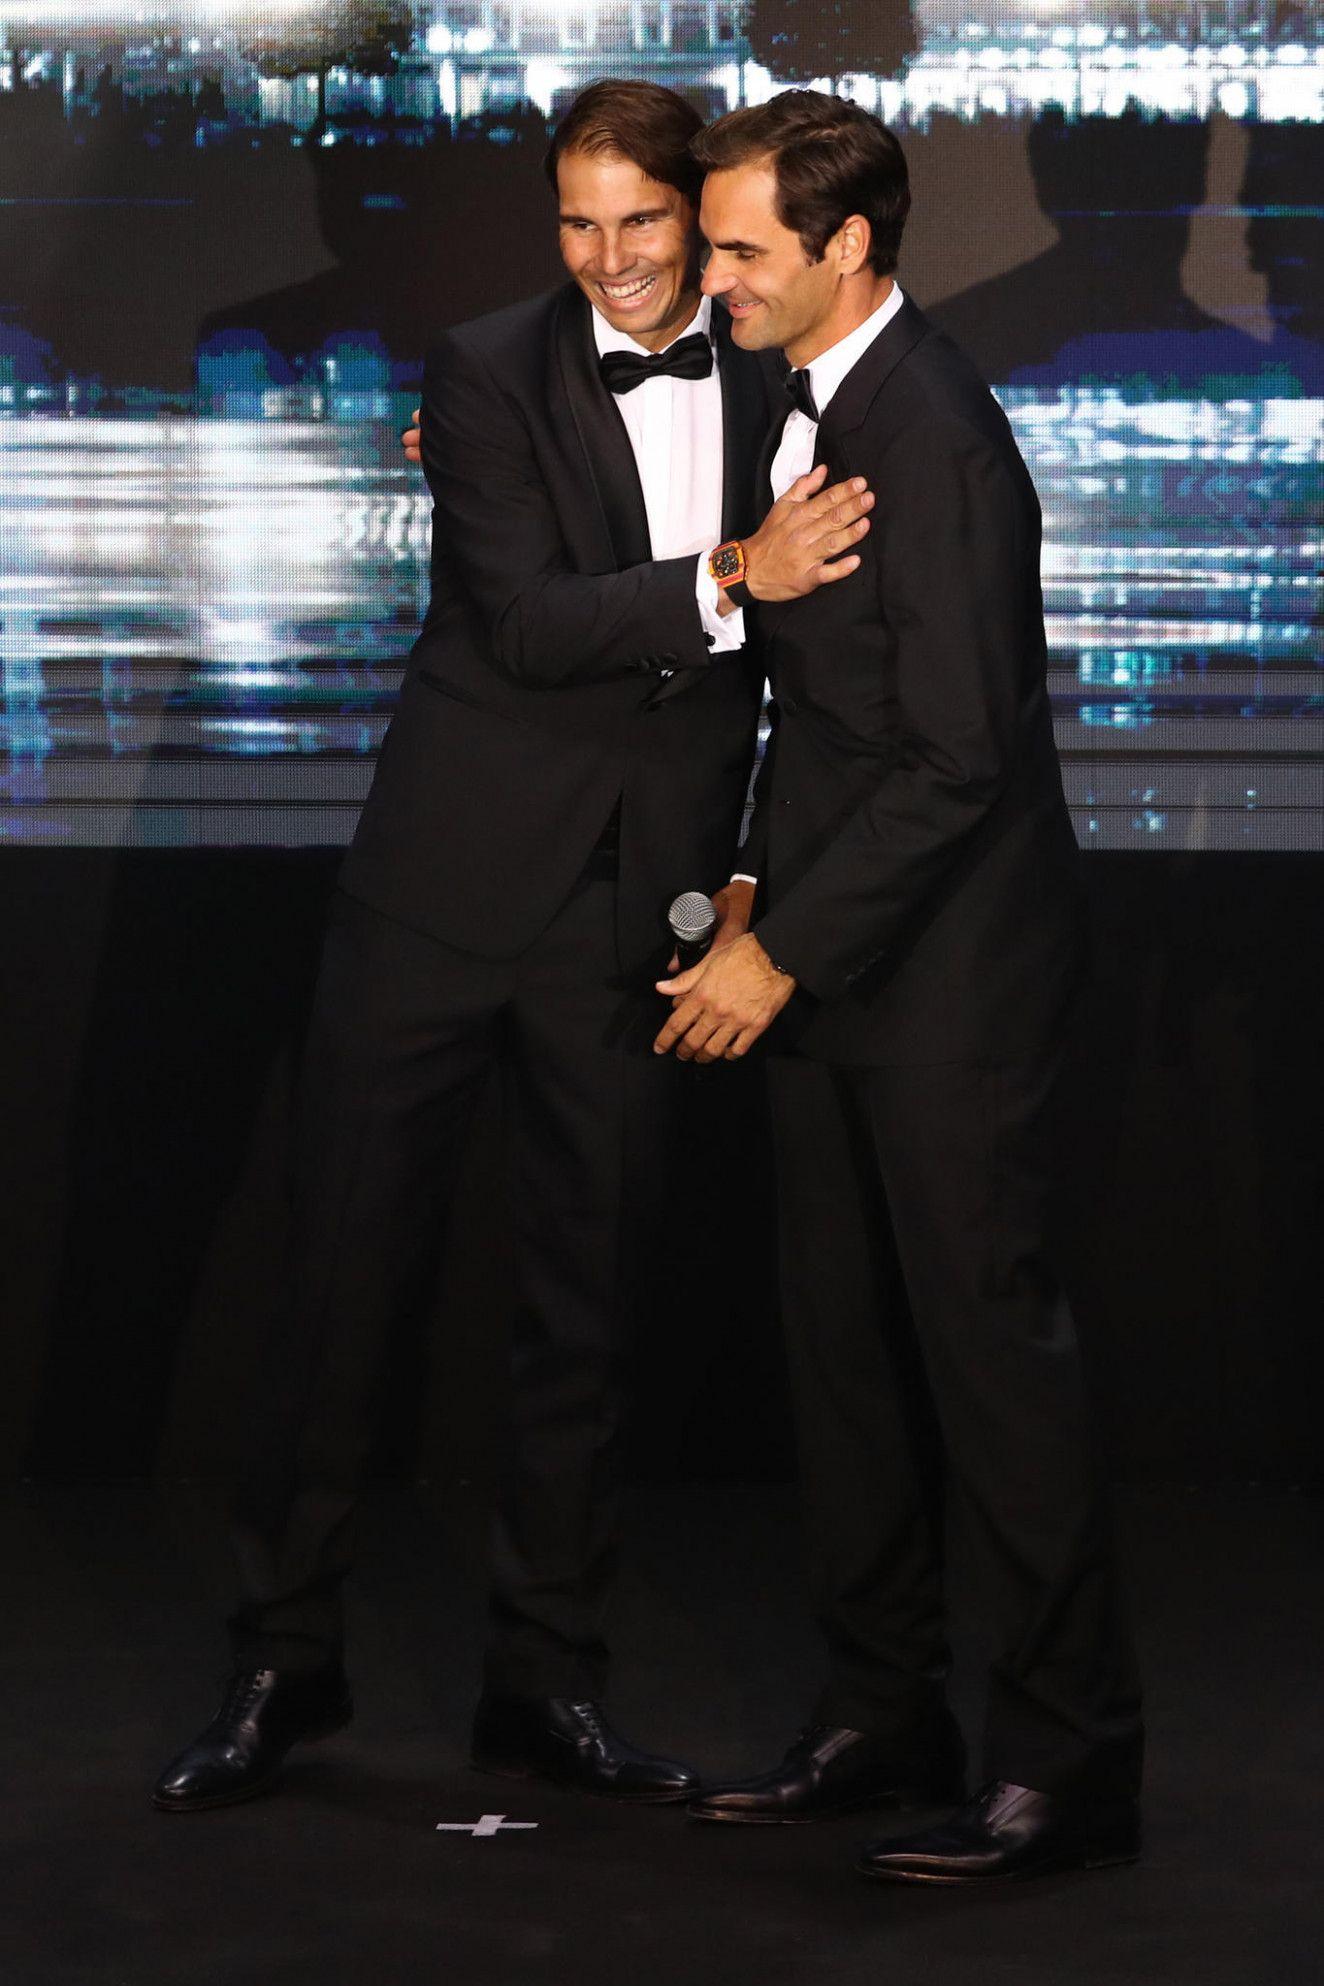 Hochzeit Nadal Mallorca Award In 2020 Tennis Legends Roger Federer Rafa Nadal